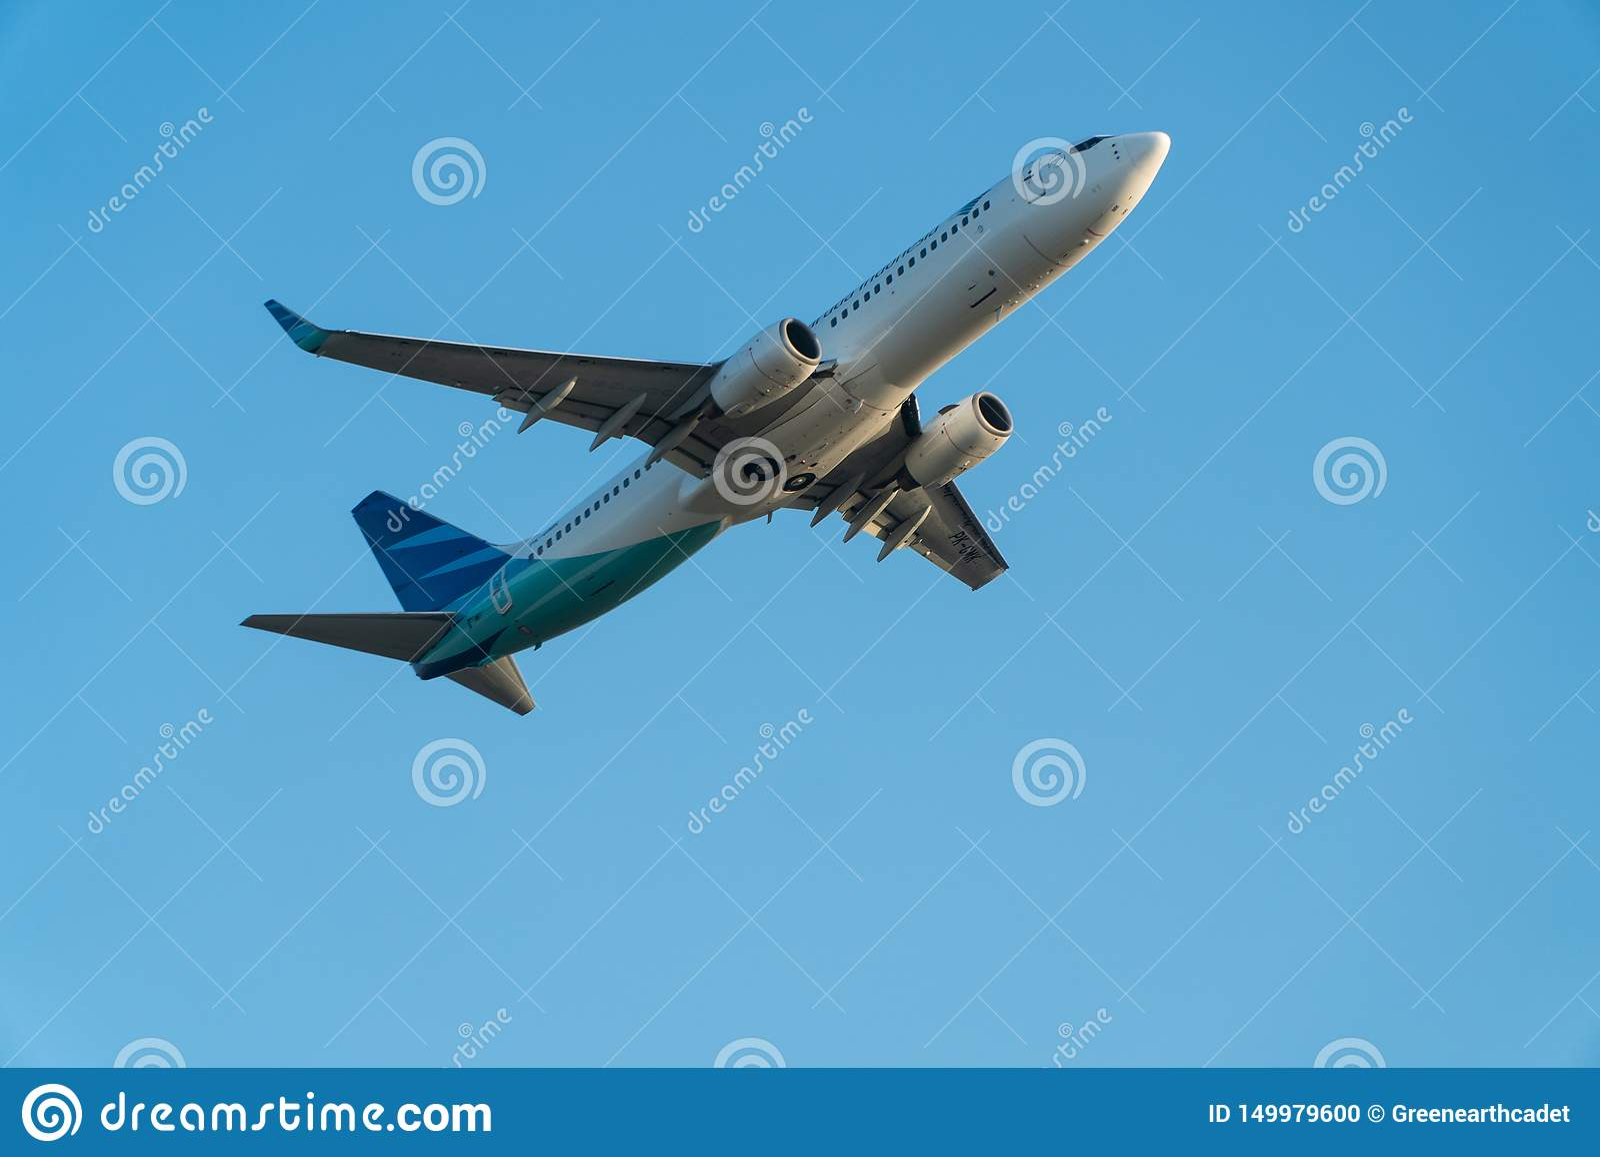 BALI/INDONESIA- 6 ΙΟΥΝΊΟΥ 2019: Το Garuda Ινδονησία, μια από τις αερογραμμές στην Ινδονησία που προσχωρεί στην ομάδα ουρανού, πετ